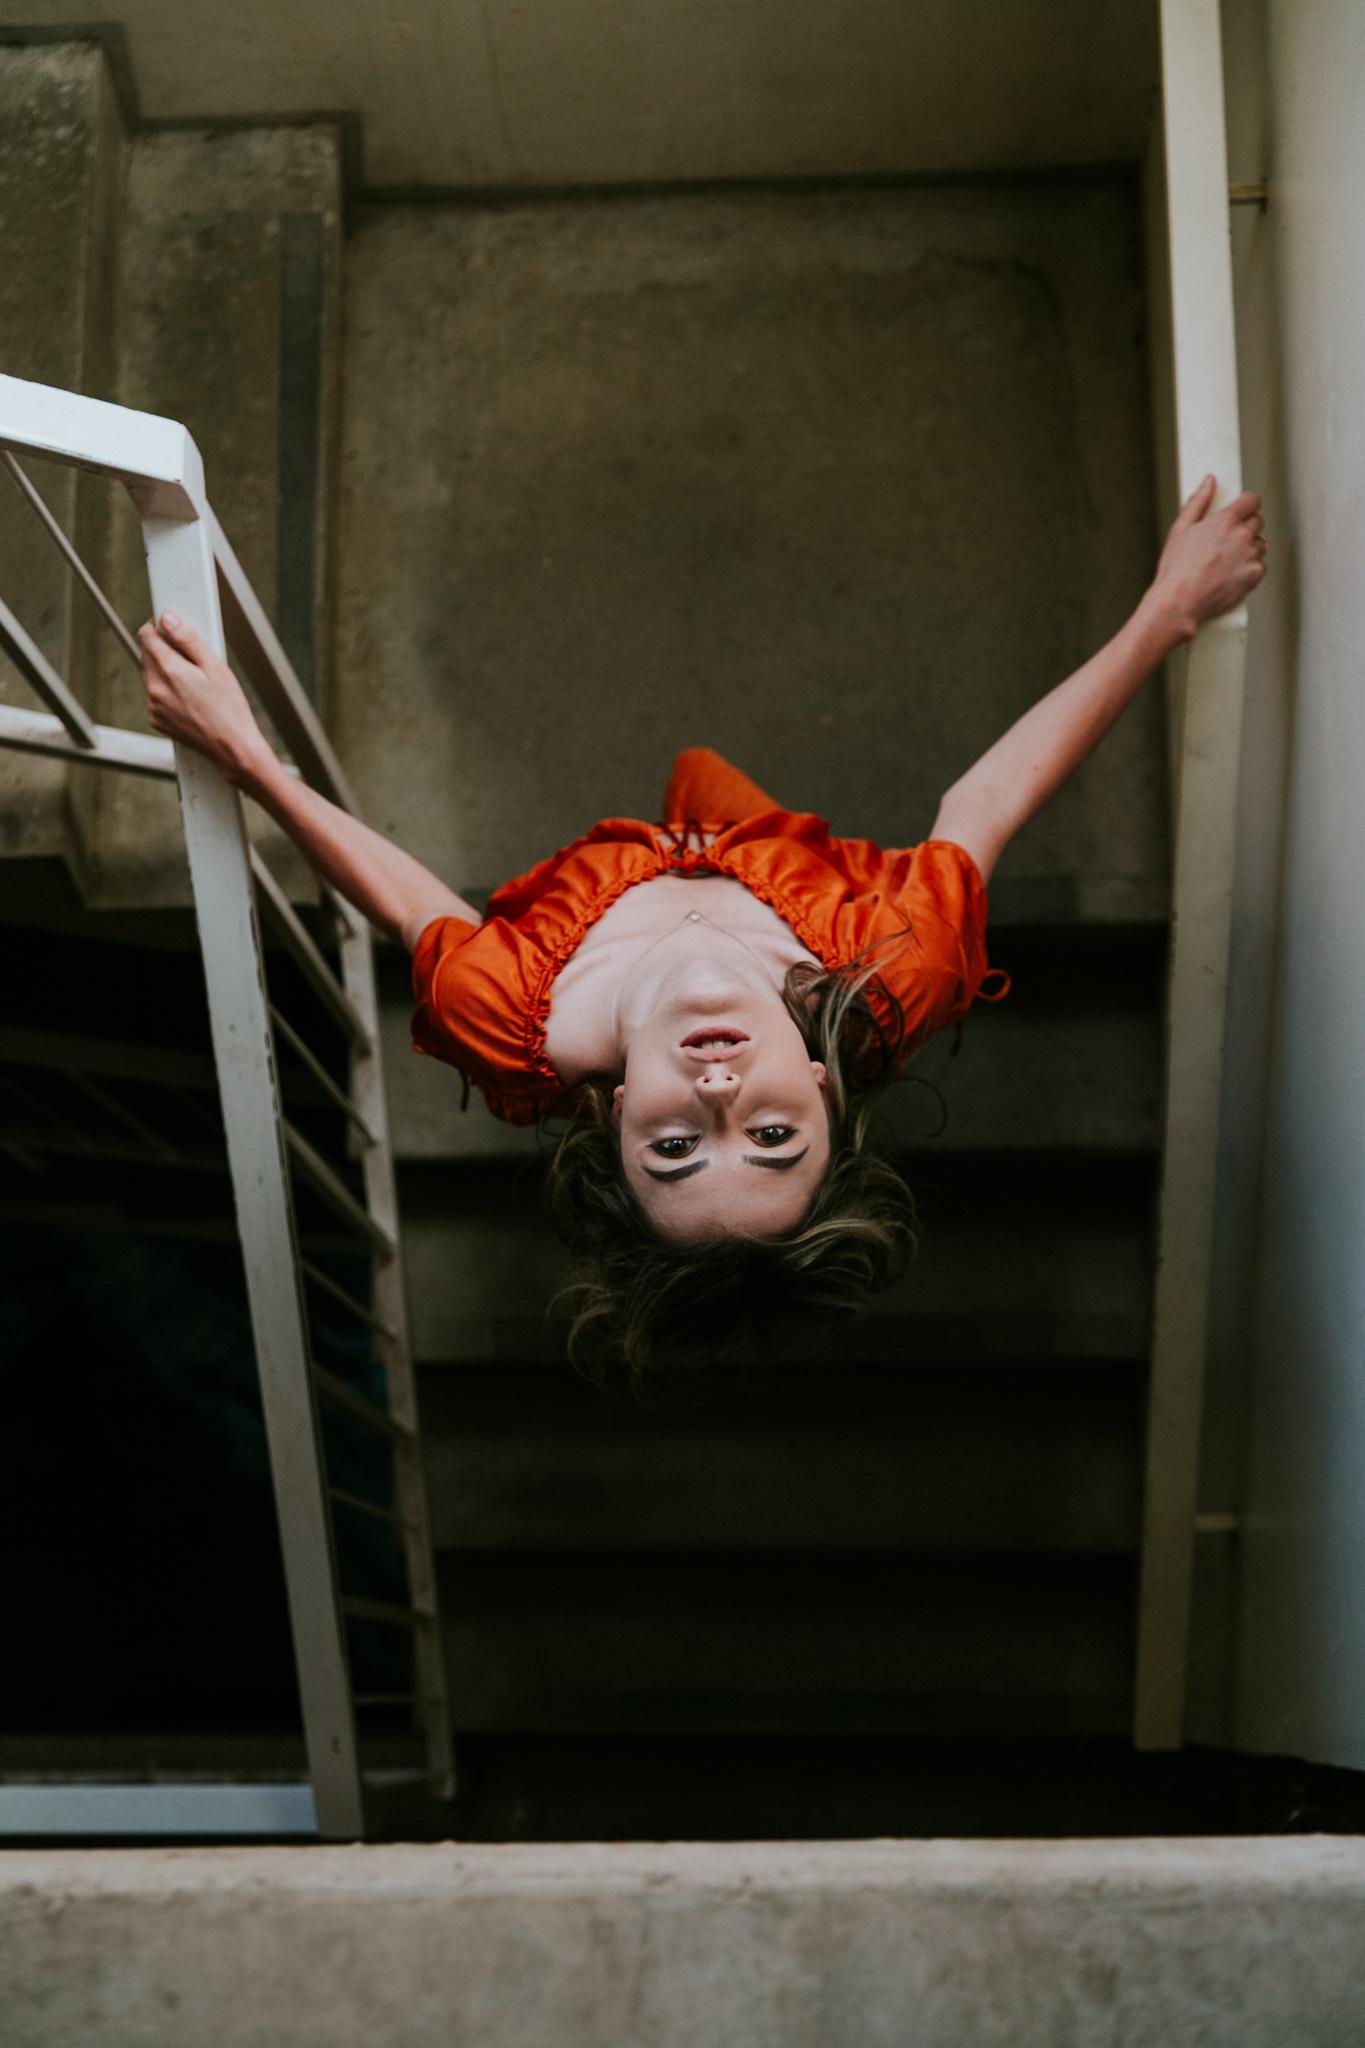 ChelseaScottEvans-Arcosanti-012.jpg